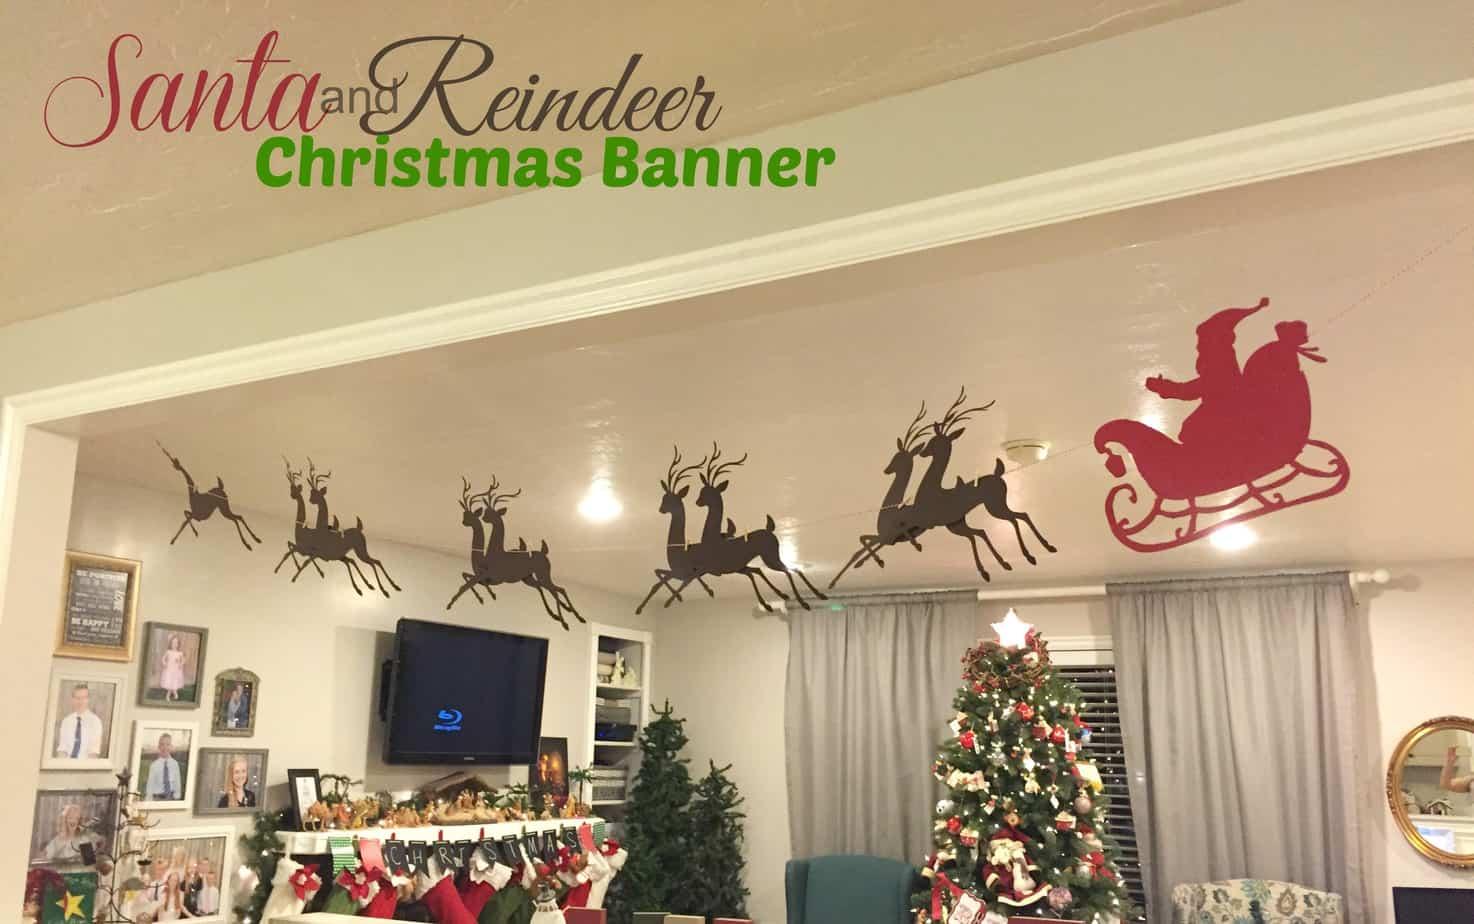 banner header - Santa And The Reindeer